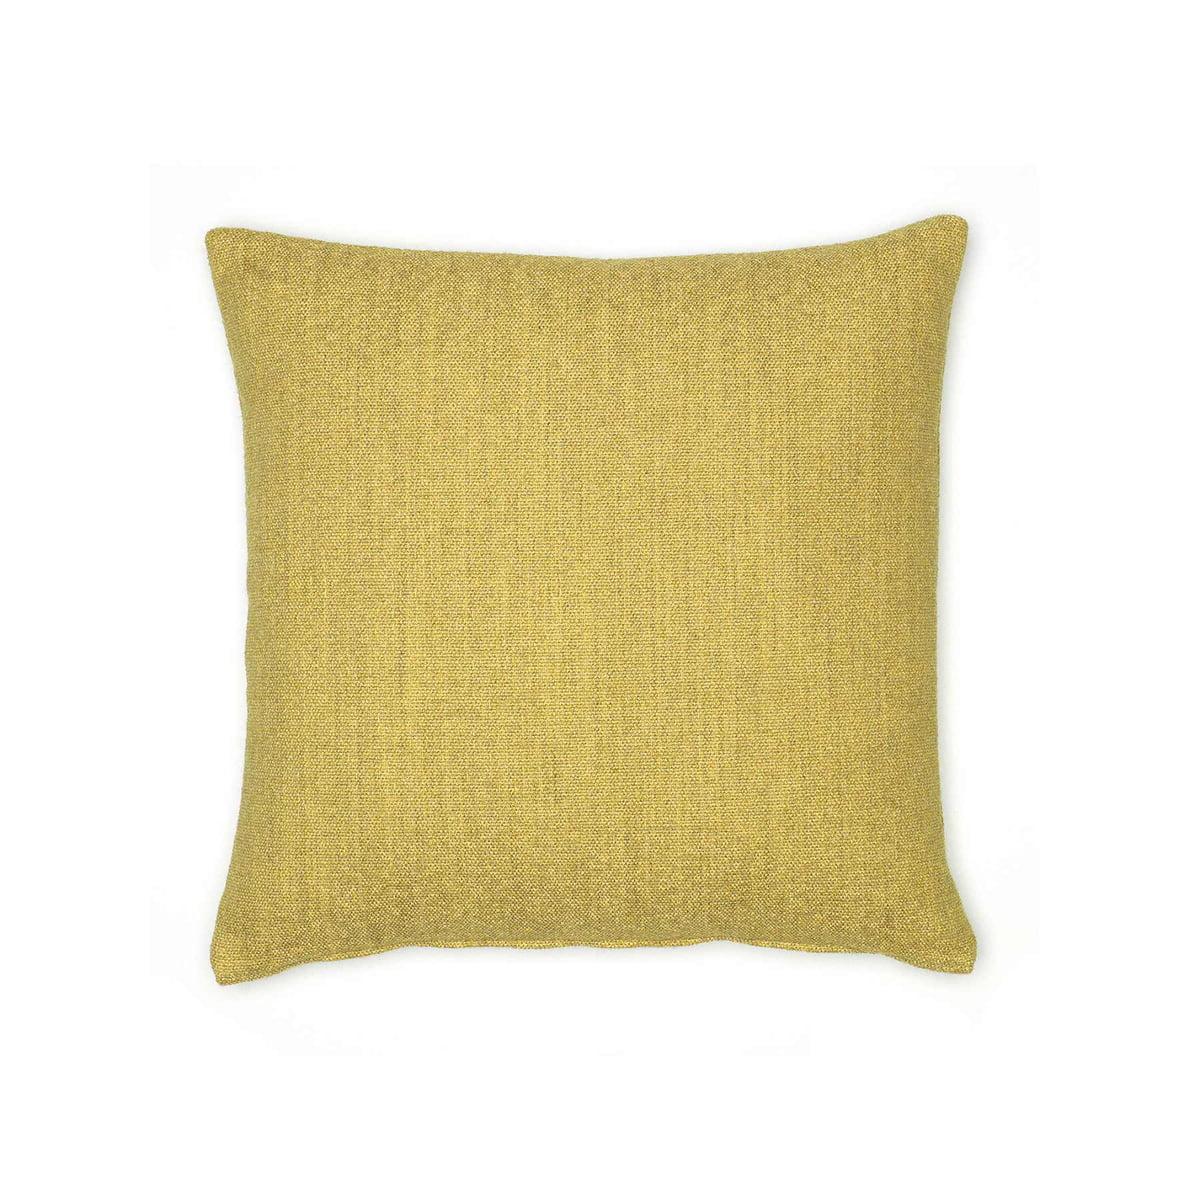 Soft modular sofa kissen 40x40 cm gelb frei